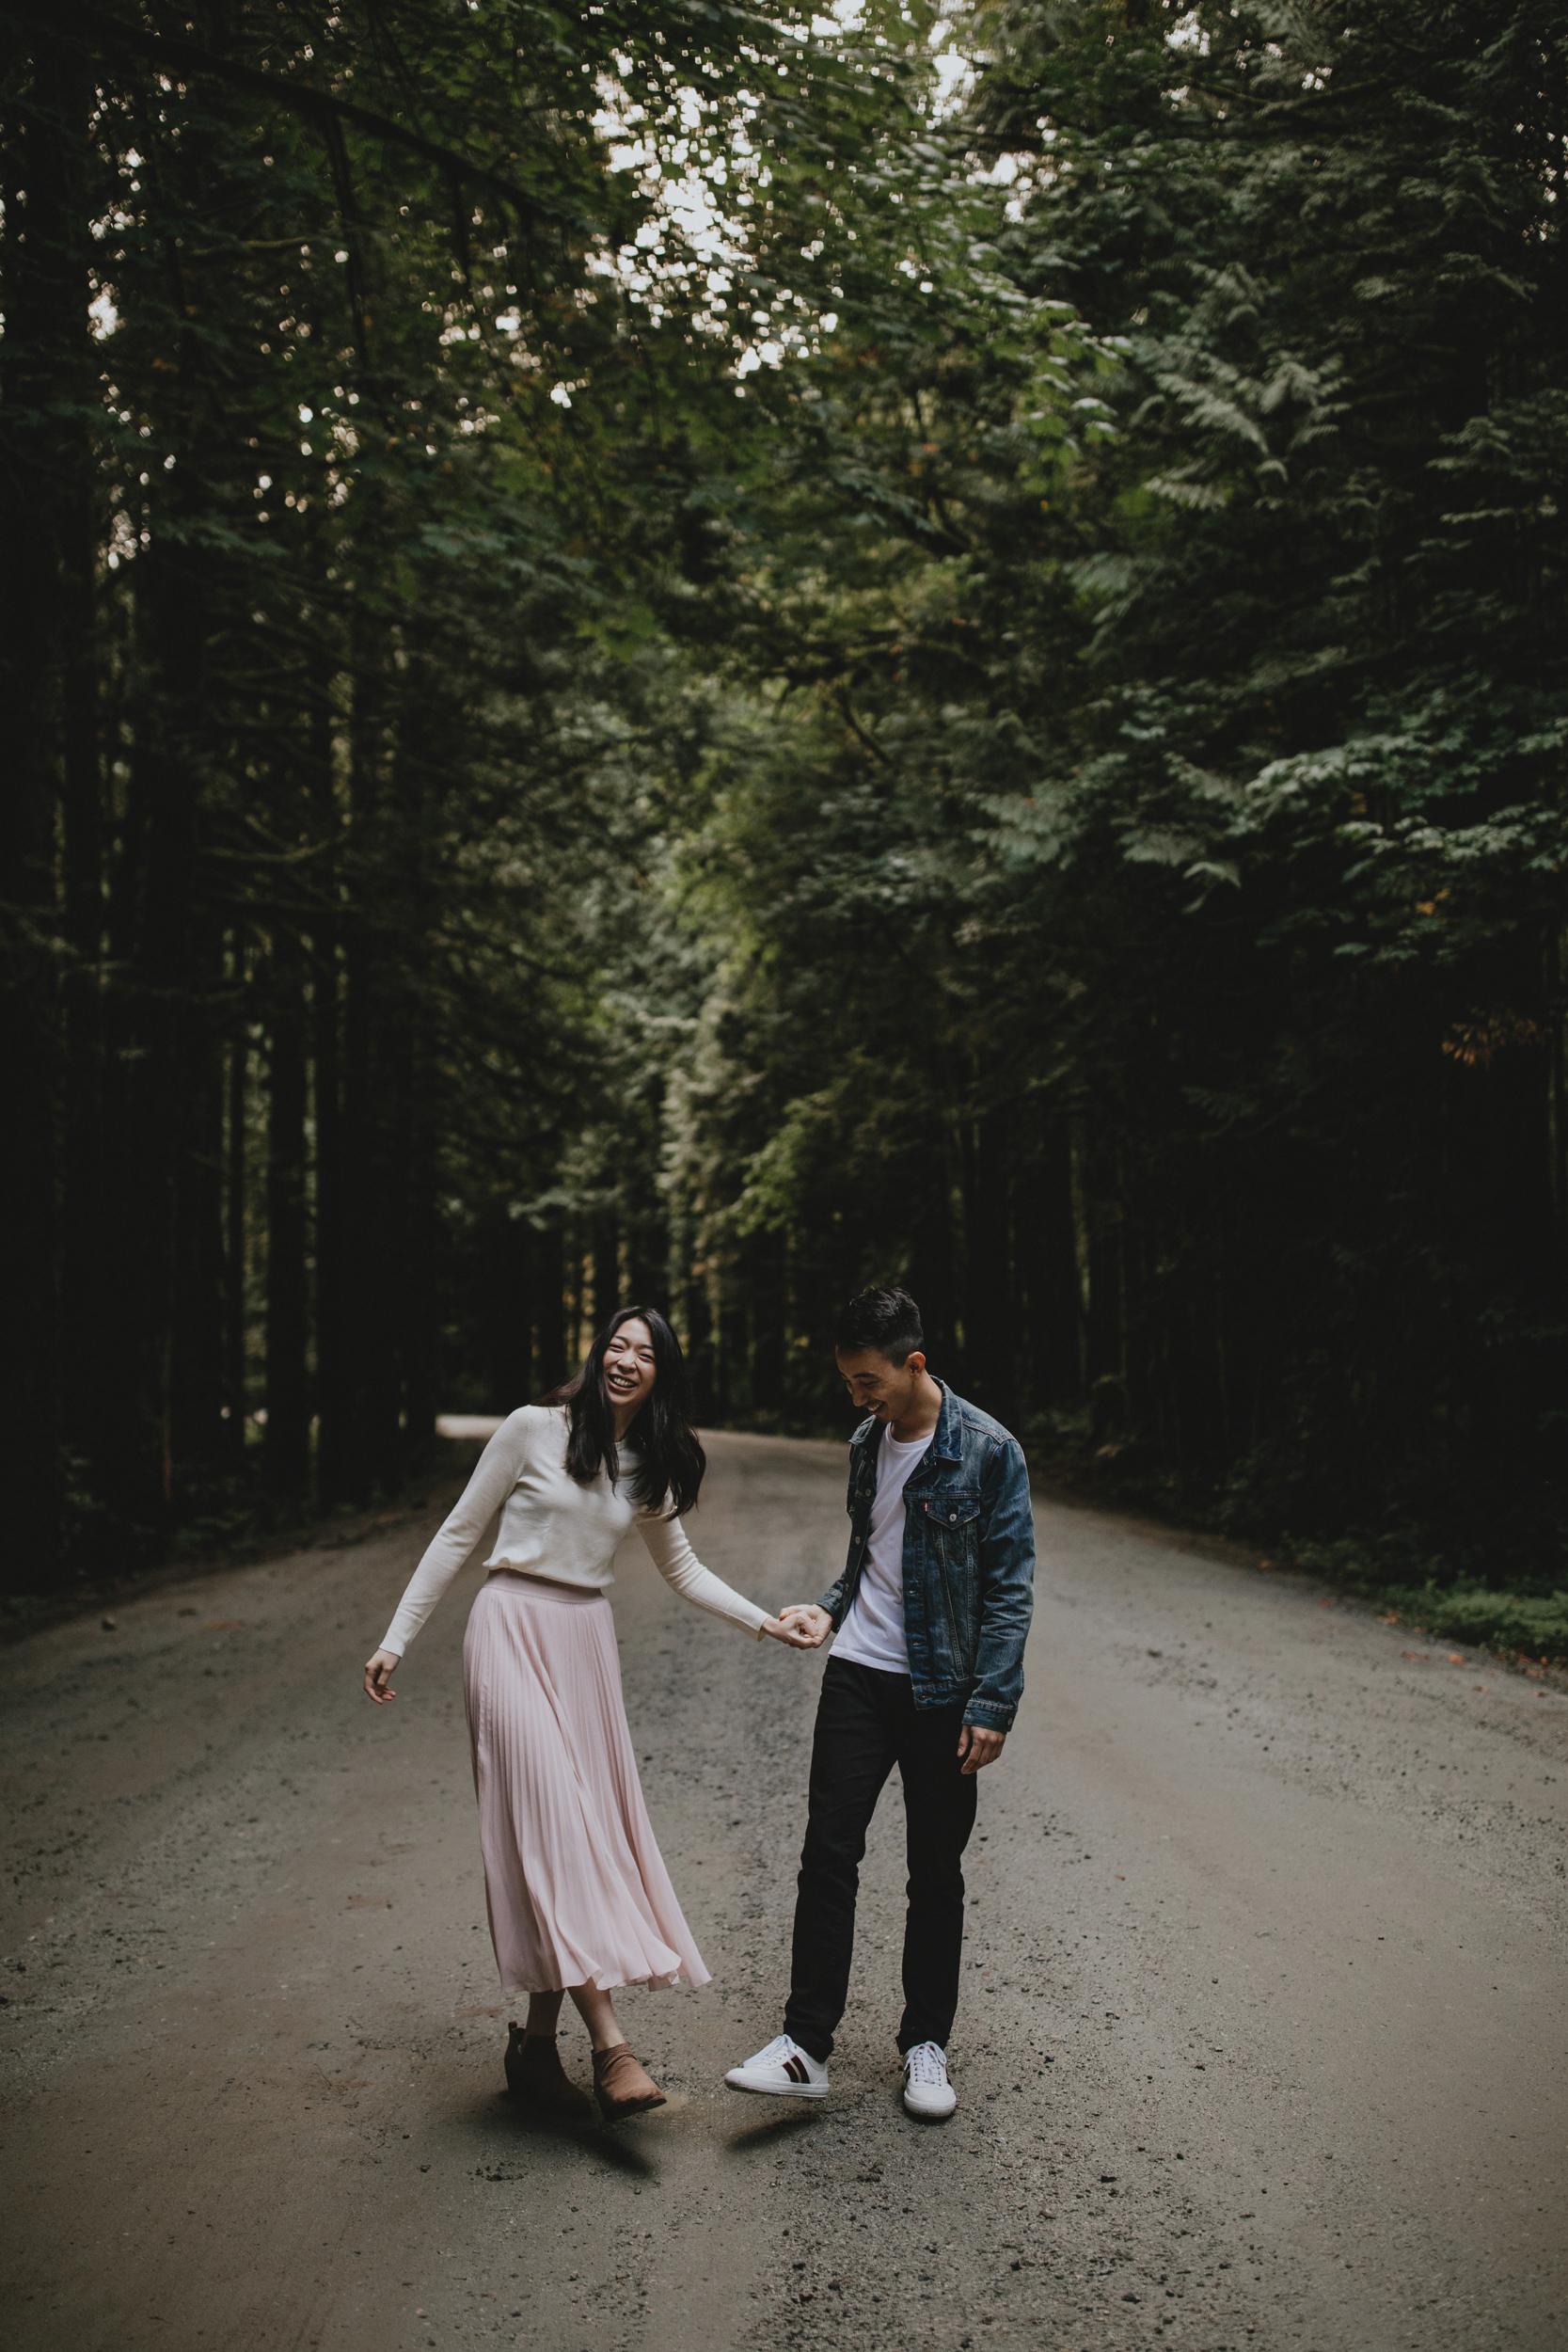 Golden-Ears-Park-Forest-Engagement-Vancouver-7.jpg